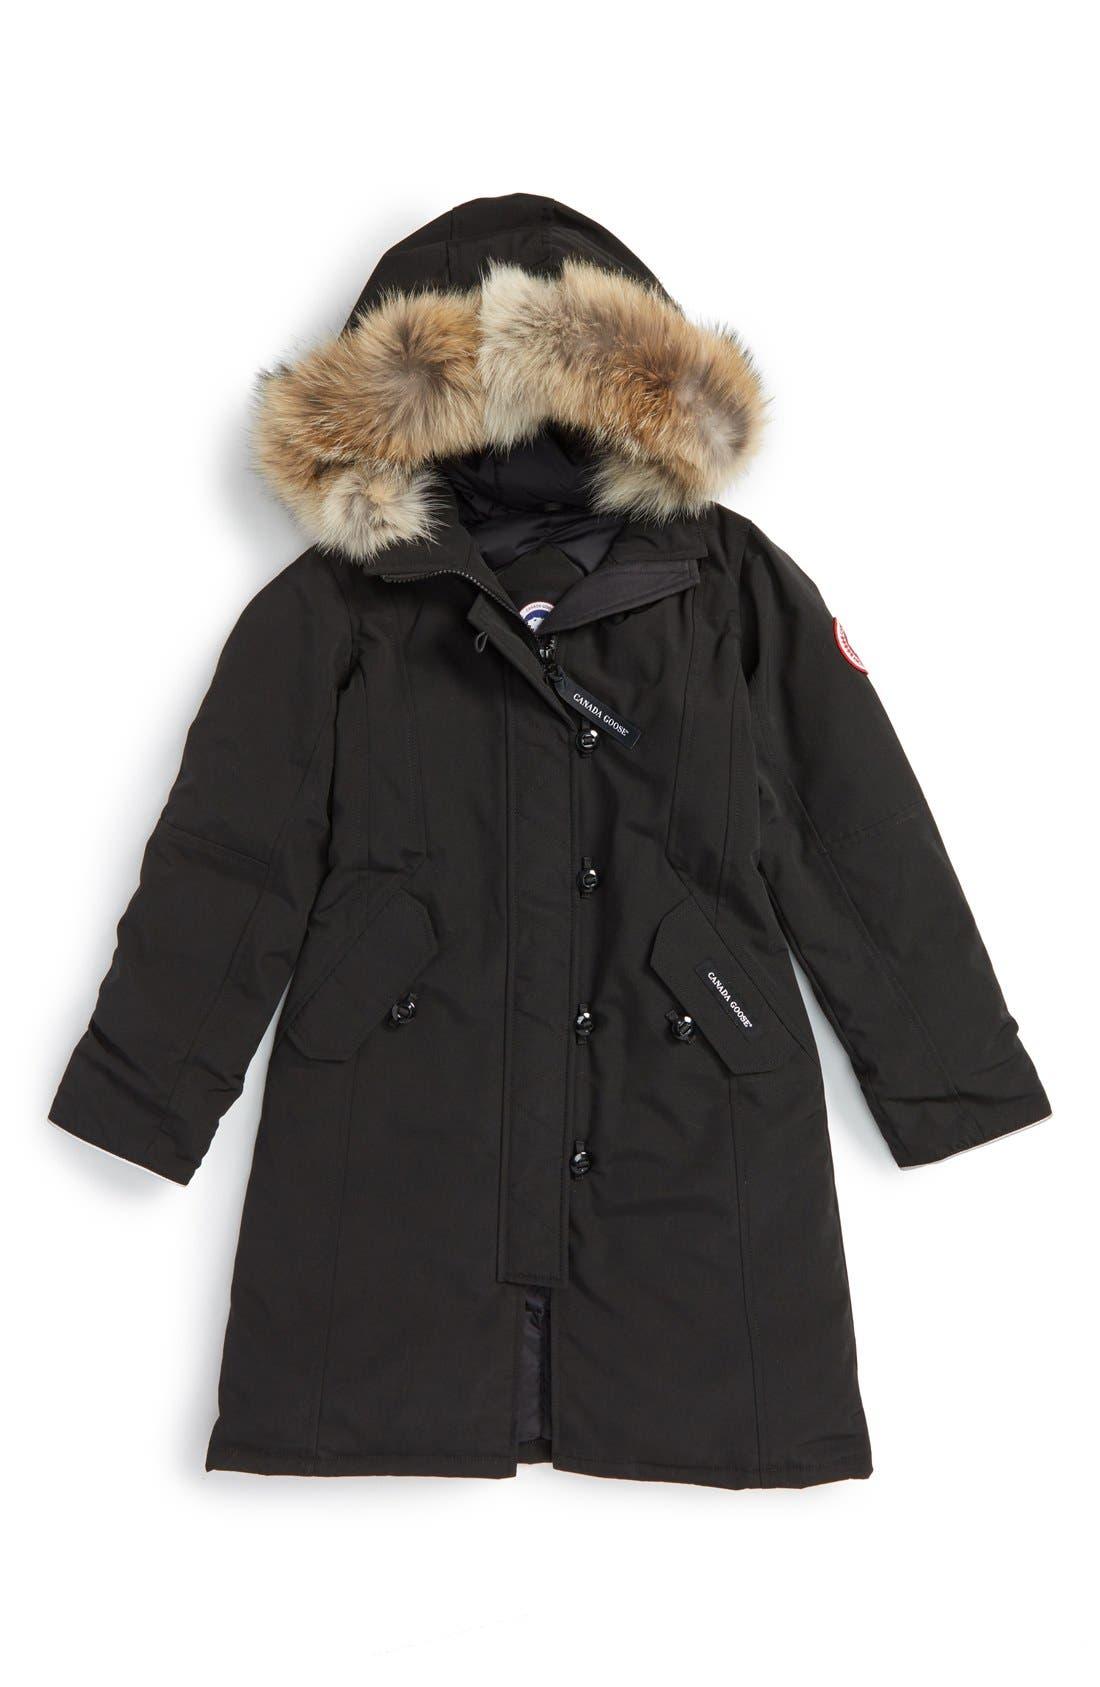 Canada Goose 'Brittania' Down Parka with Genuine Coyote Fur Trim (Little Kid & Big Kid)